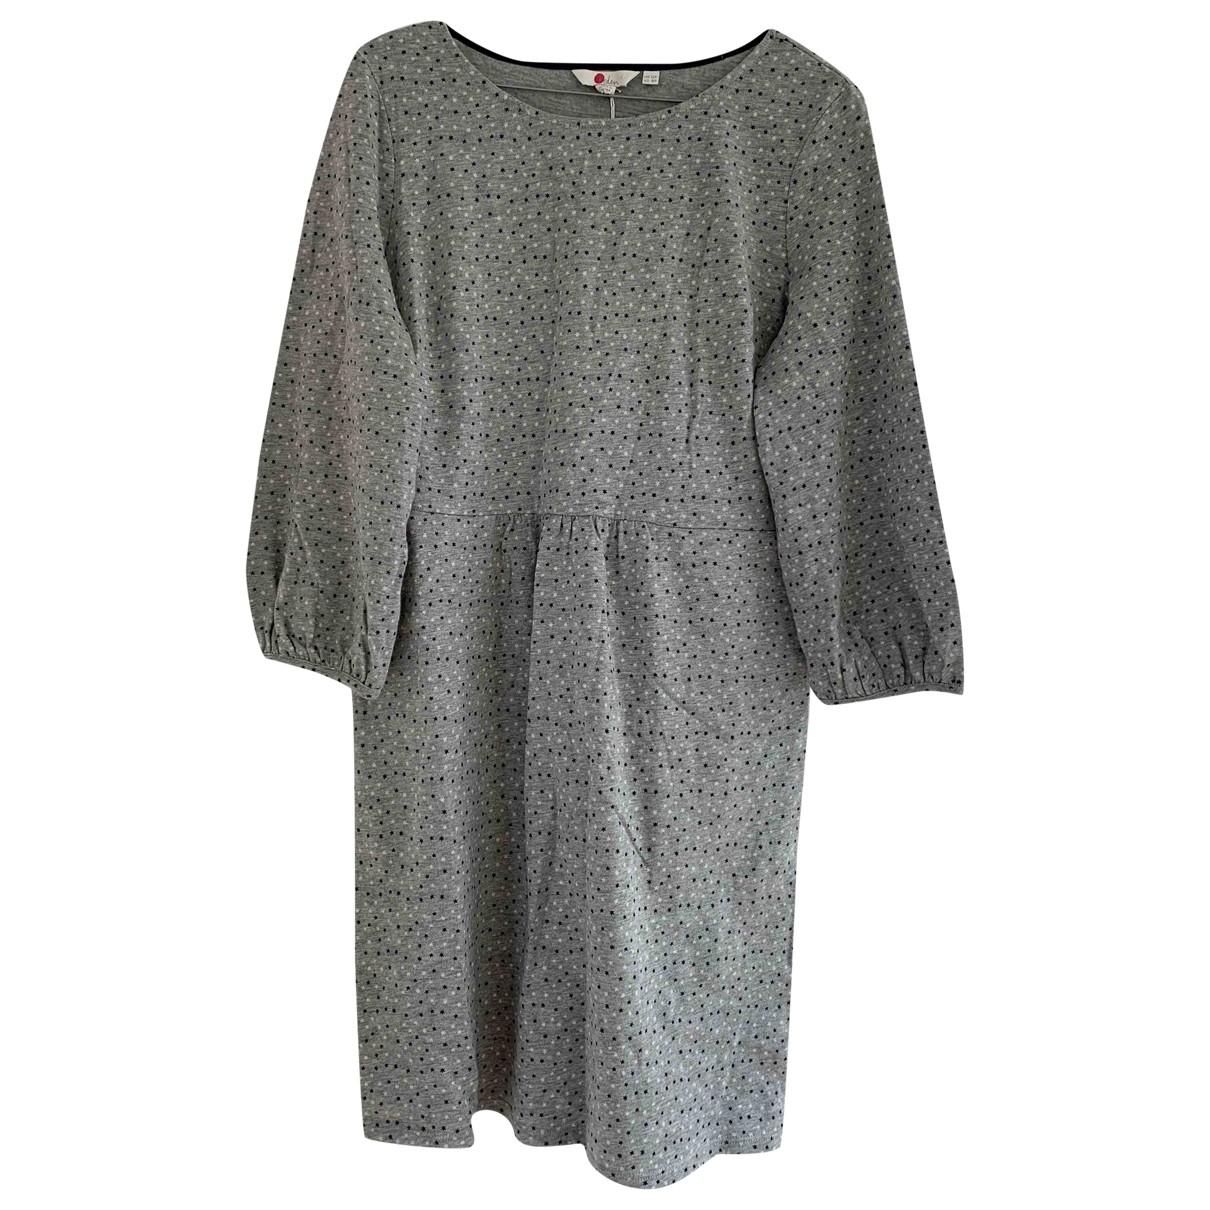 Boden \N Grey Cotton dress for Women 12 UK